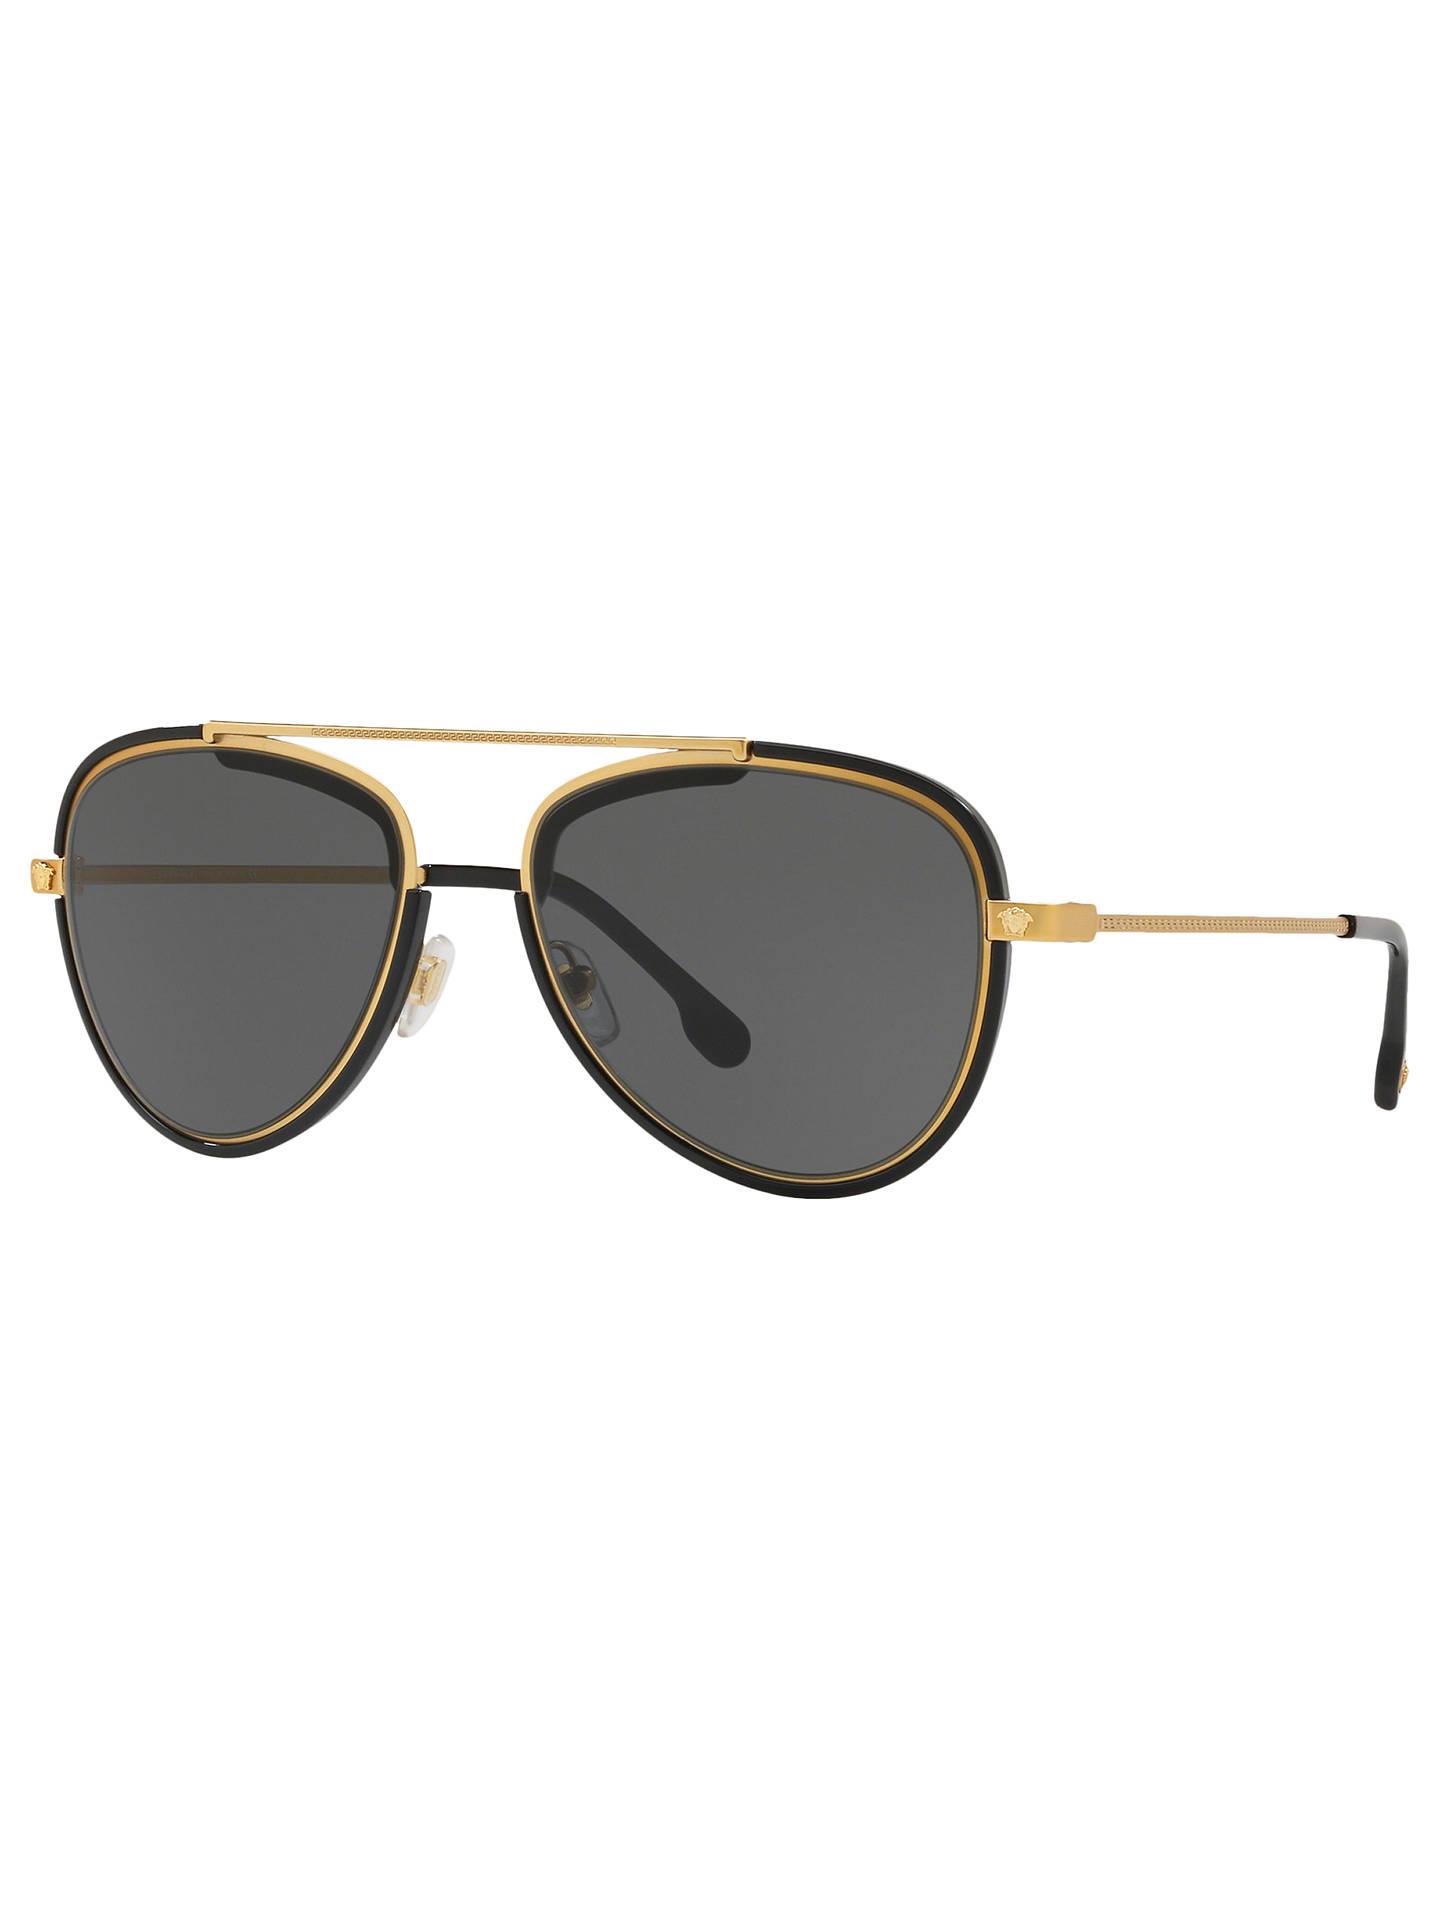 1a1a6d9dec5 Versace VE2193 Men s Aviator Sunglasses at John Lewis   Partners